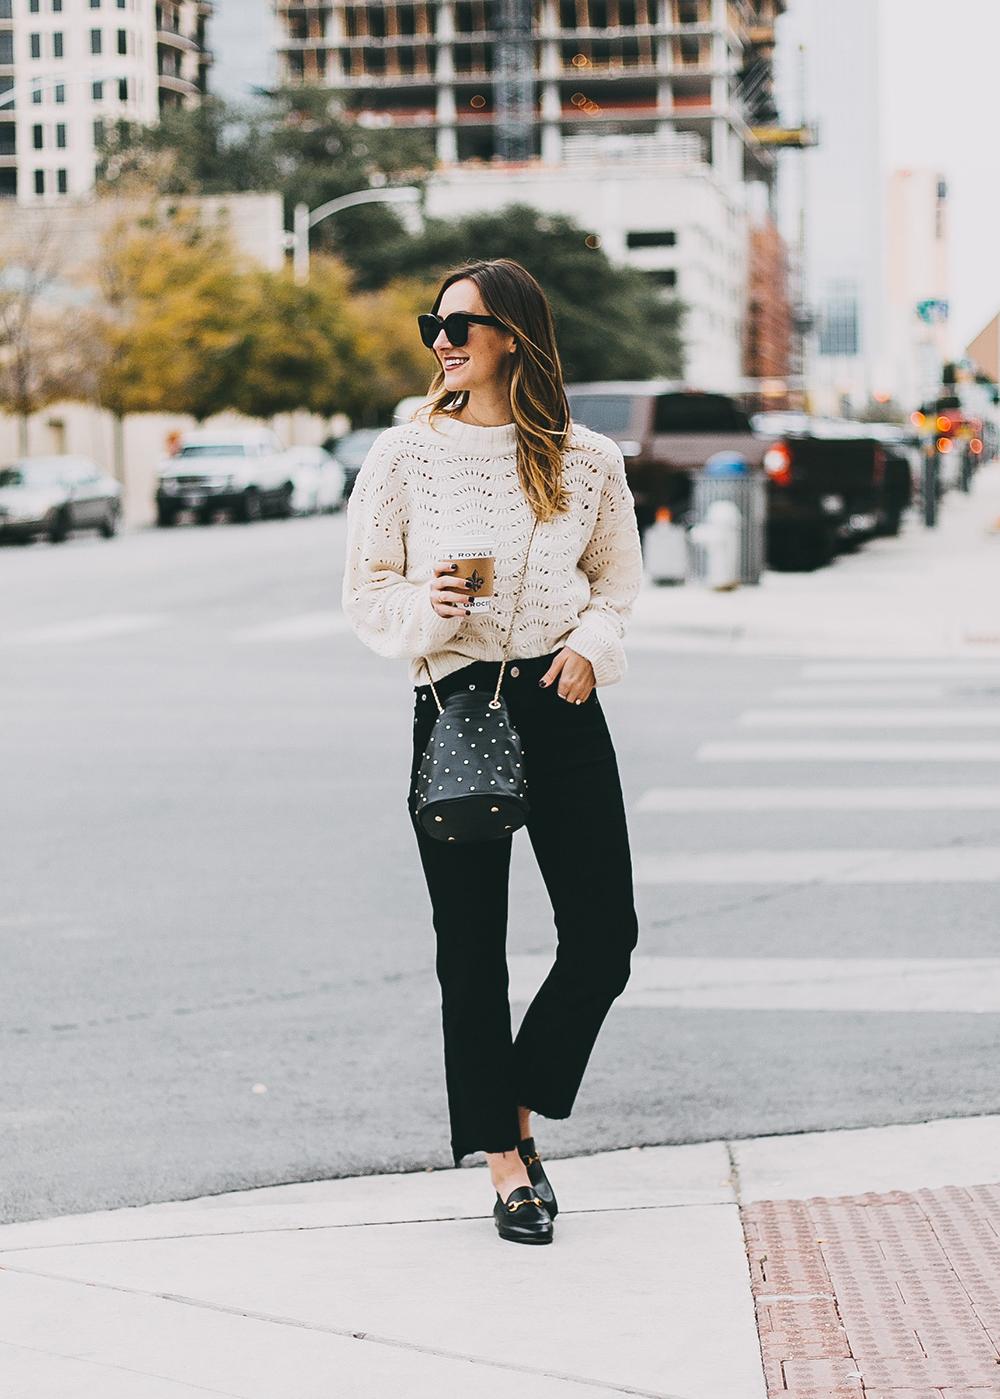 livvyland-blog-olivia-watson-austin-texas-fashion-blogger-white-knit-sweater-rag-bone-crop-flare-black-jeans-gucci-loafers-8